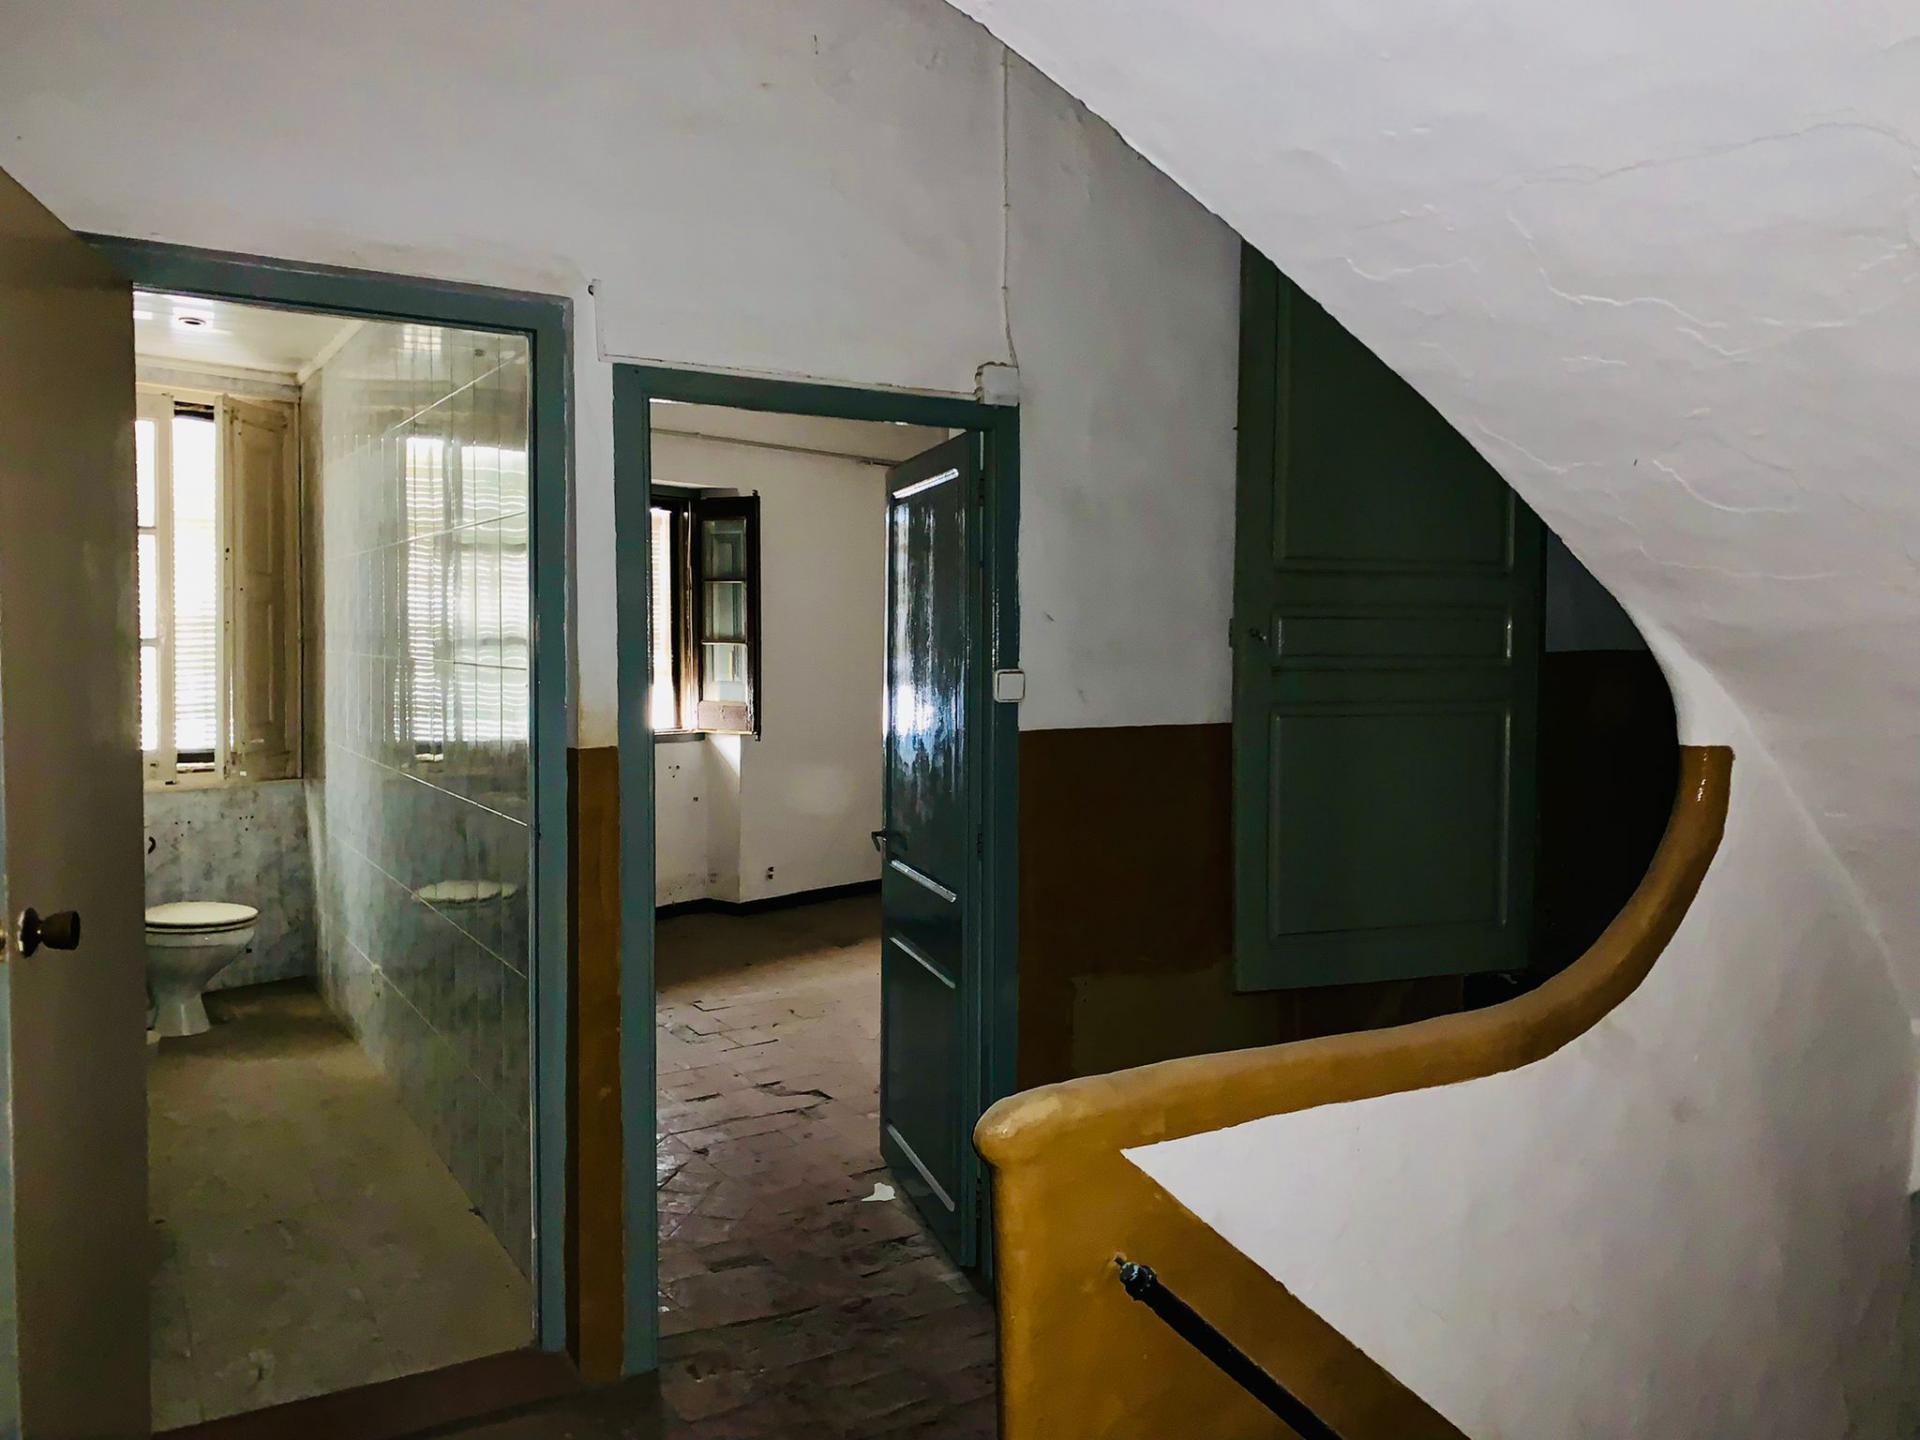 Foto 2 (V-750-2021) - Inmueble en  Venda a Sant Pere de Riudebitlles